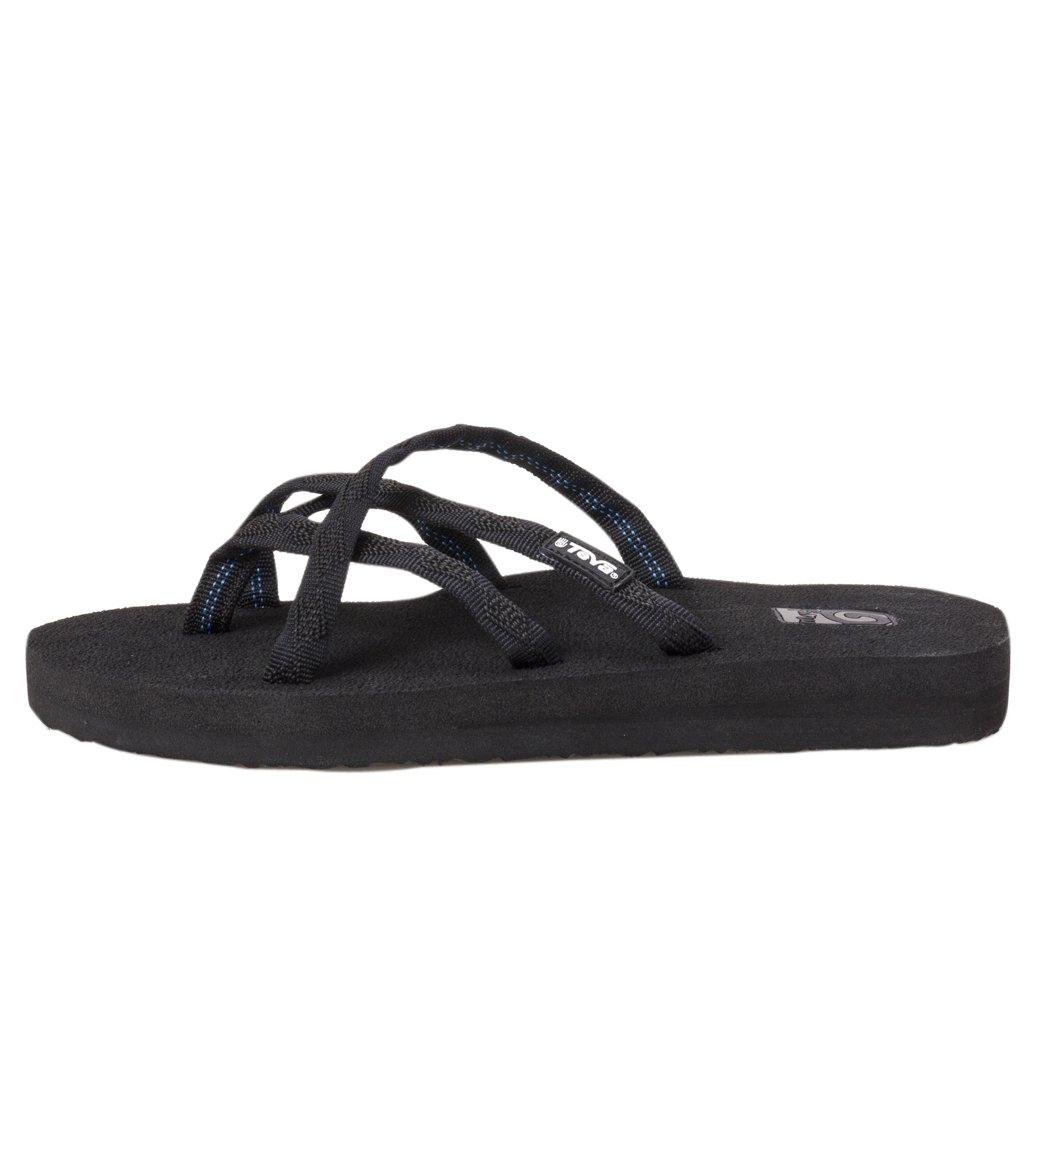 dc5bead1480b6 Teva Women's Olowahu Sandal